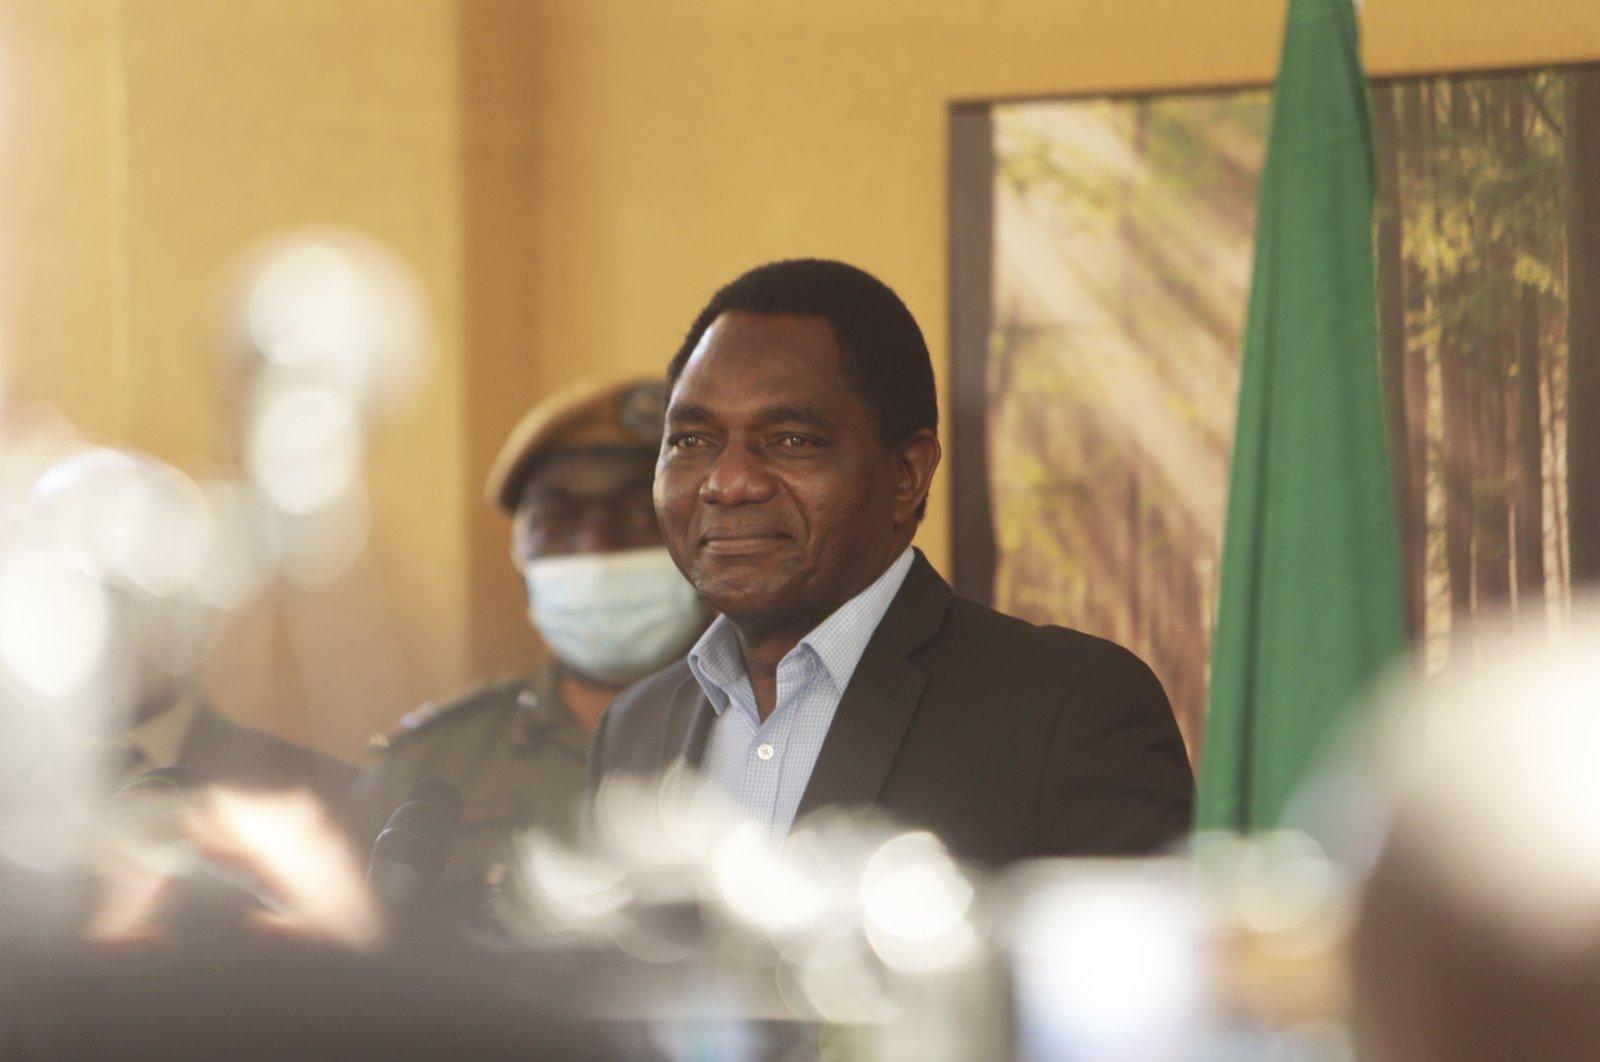 Zambian President-elect Hakainde Hichilema addresses a press conference at his residence in Lusaka, Zambia, Aug, 16, 2021. (AP Photo)